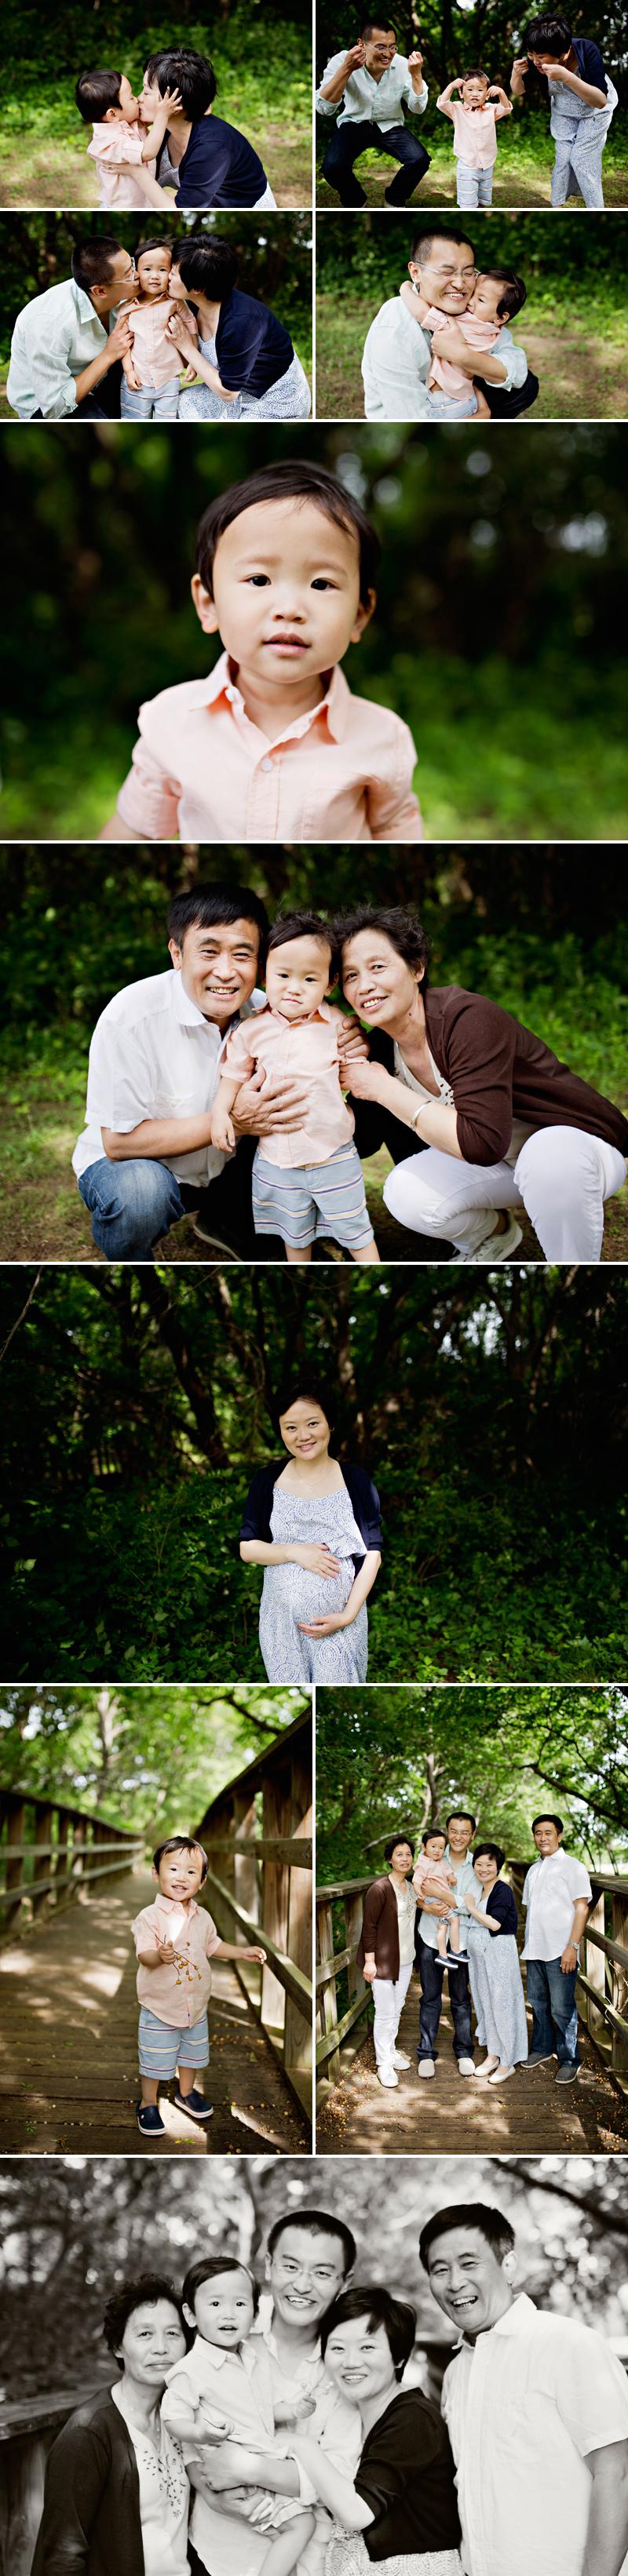 Dallas-Family-Photographercomp008